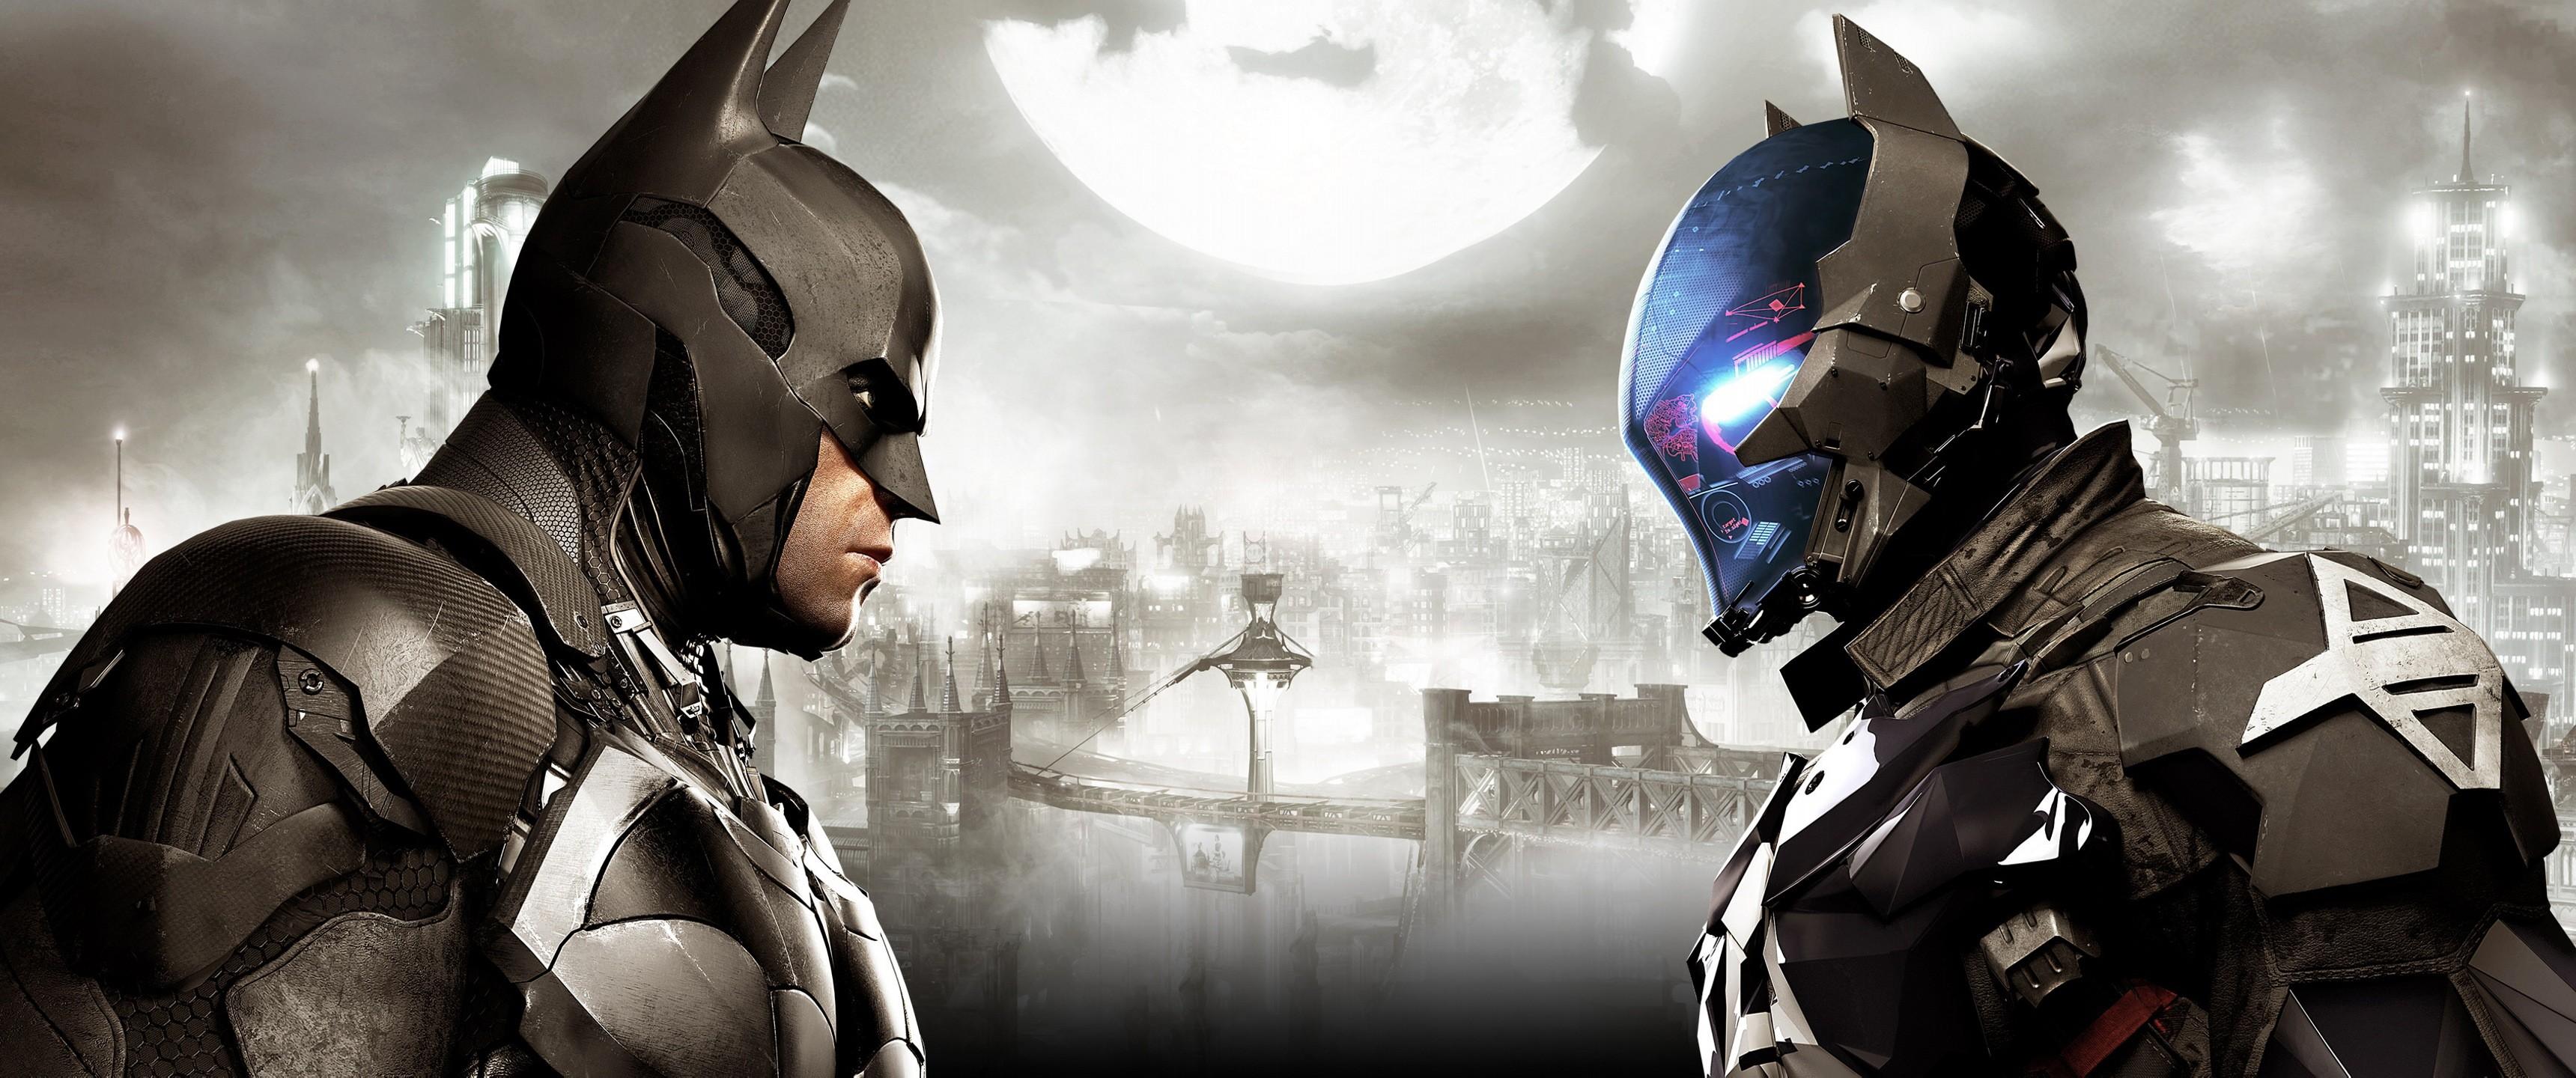 Wallpaper Video Games Anime Batman Arkham Knight Rocksteady